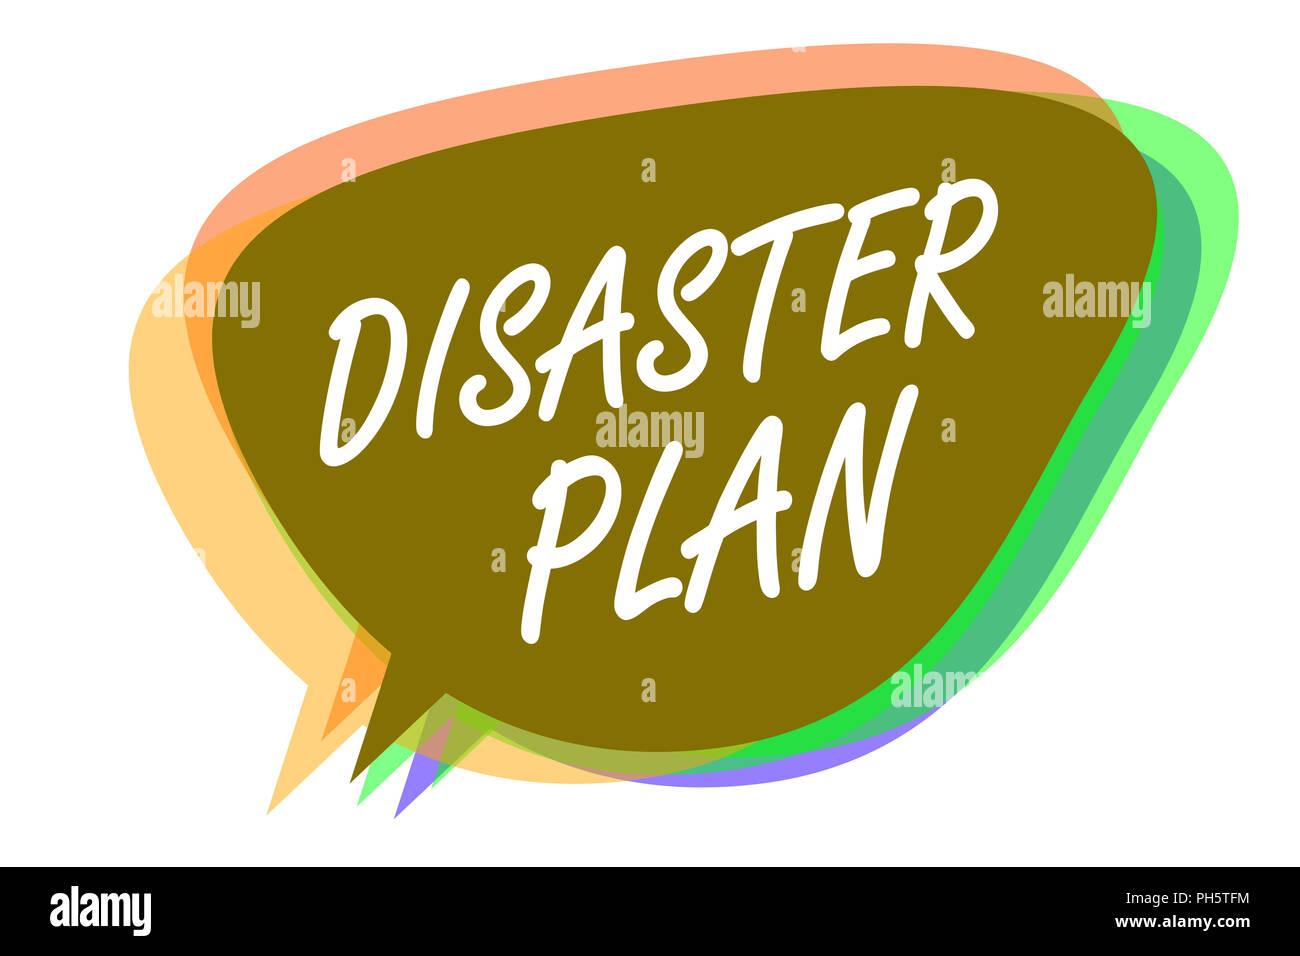 emergency preparedness plan business